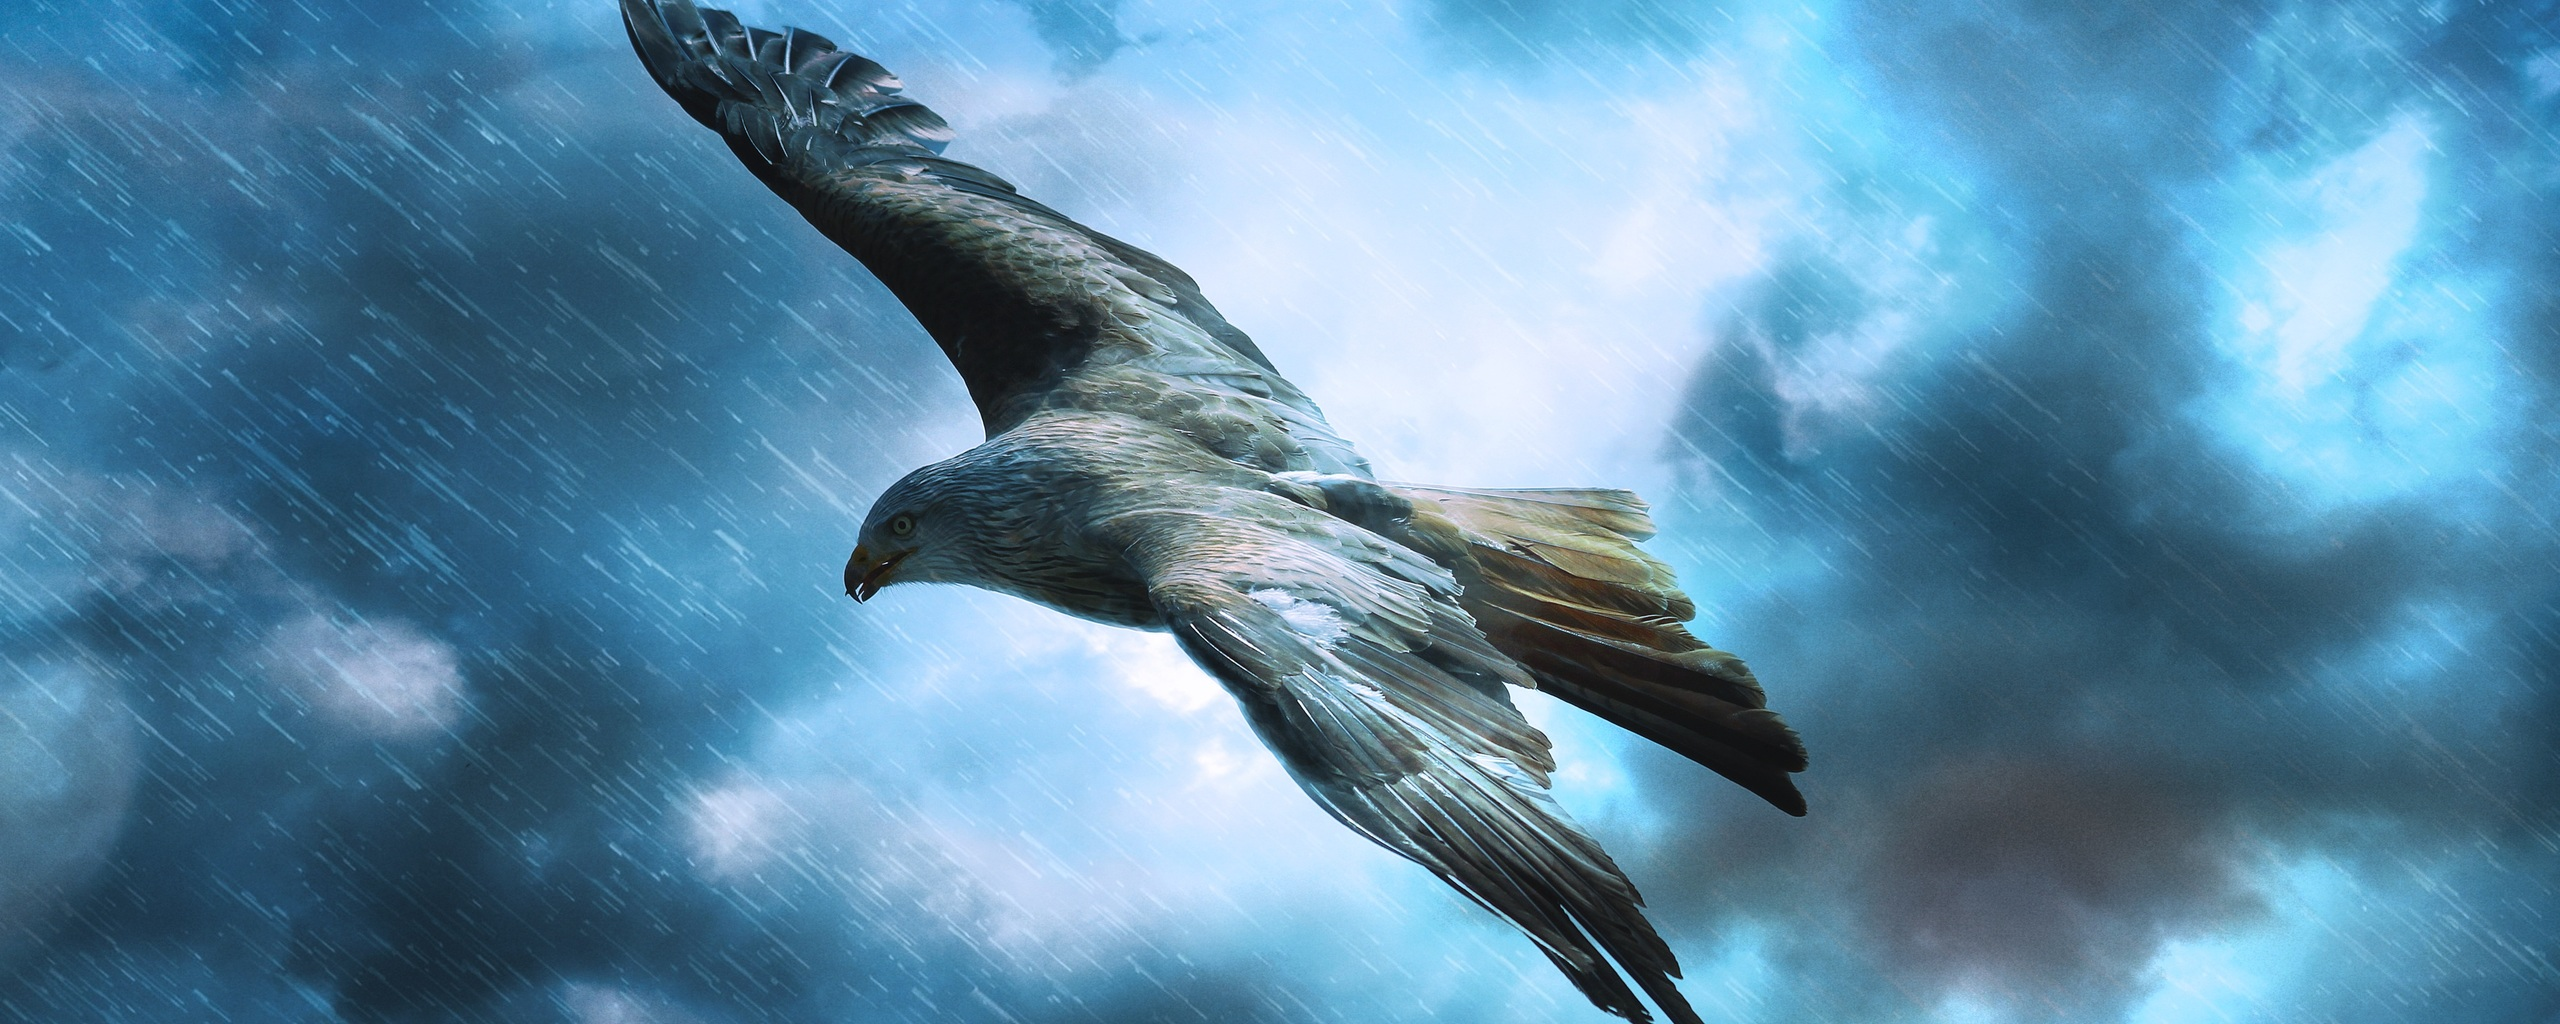 adler-raptor-eagle-5k-3z.jpg